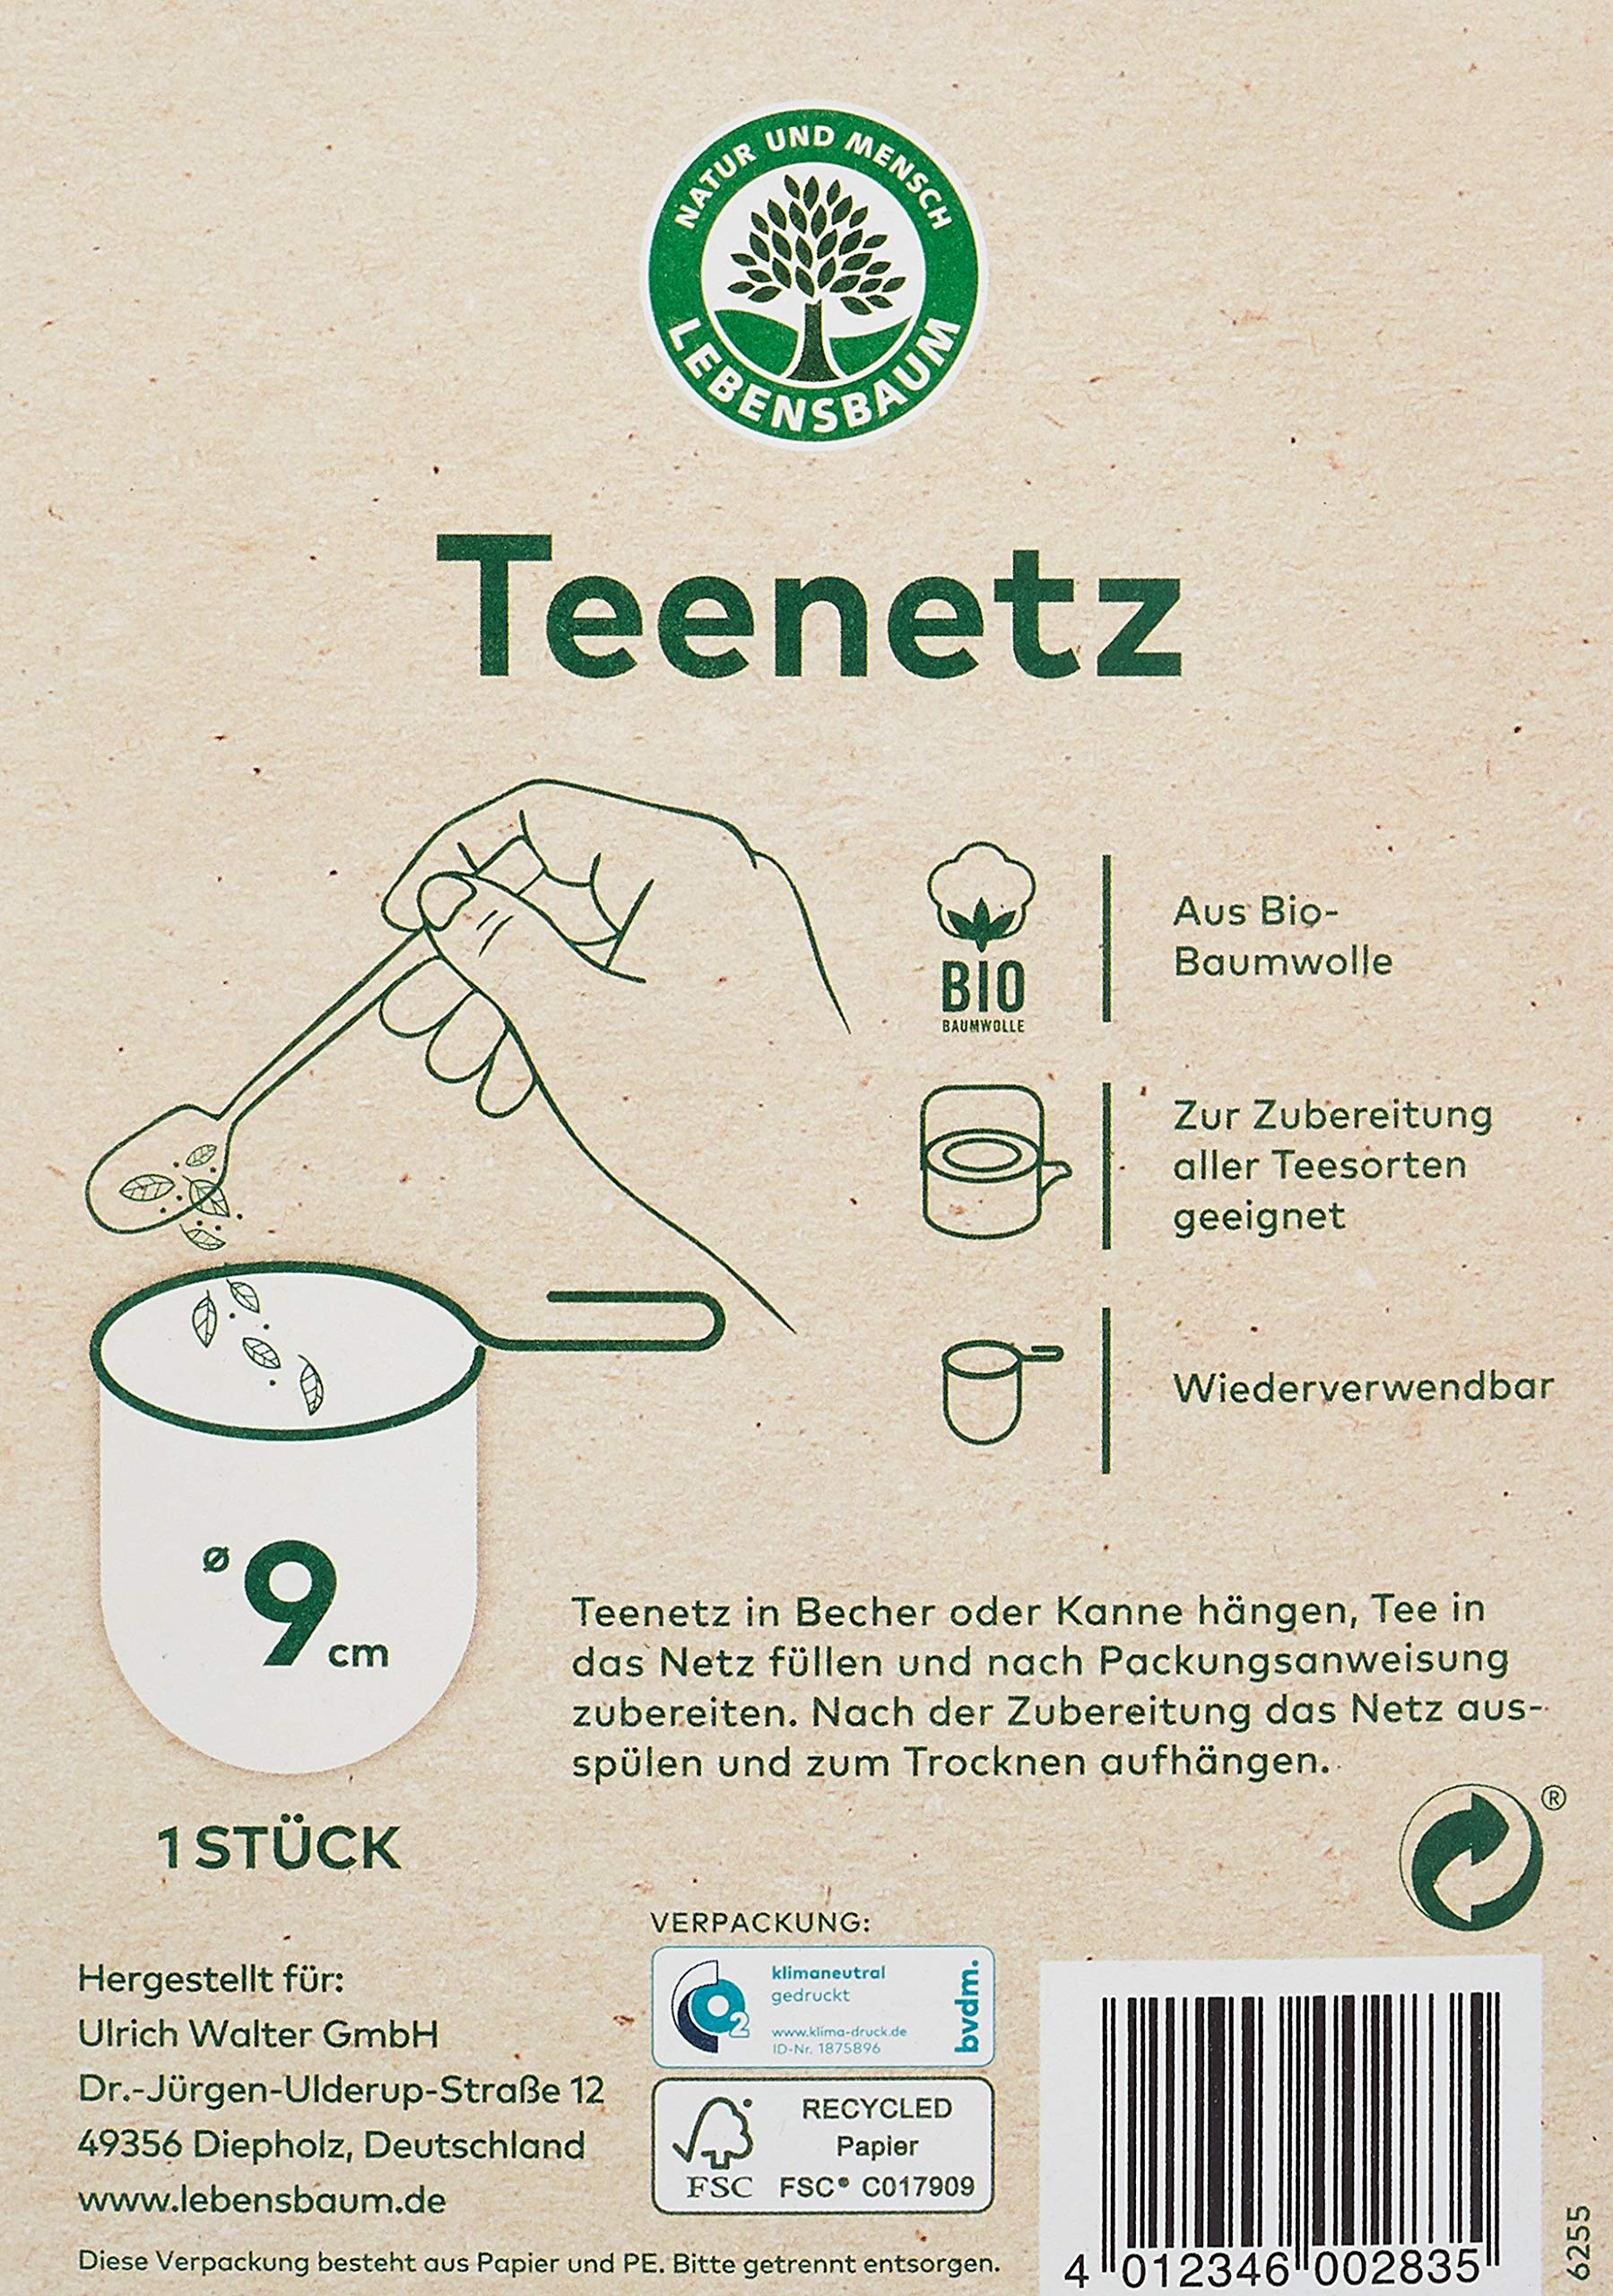 Lebensbaum-Teenetze-Gr-2-9-Cm-1-Stck